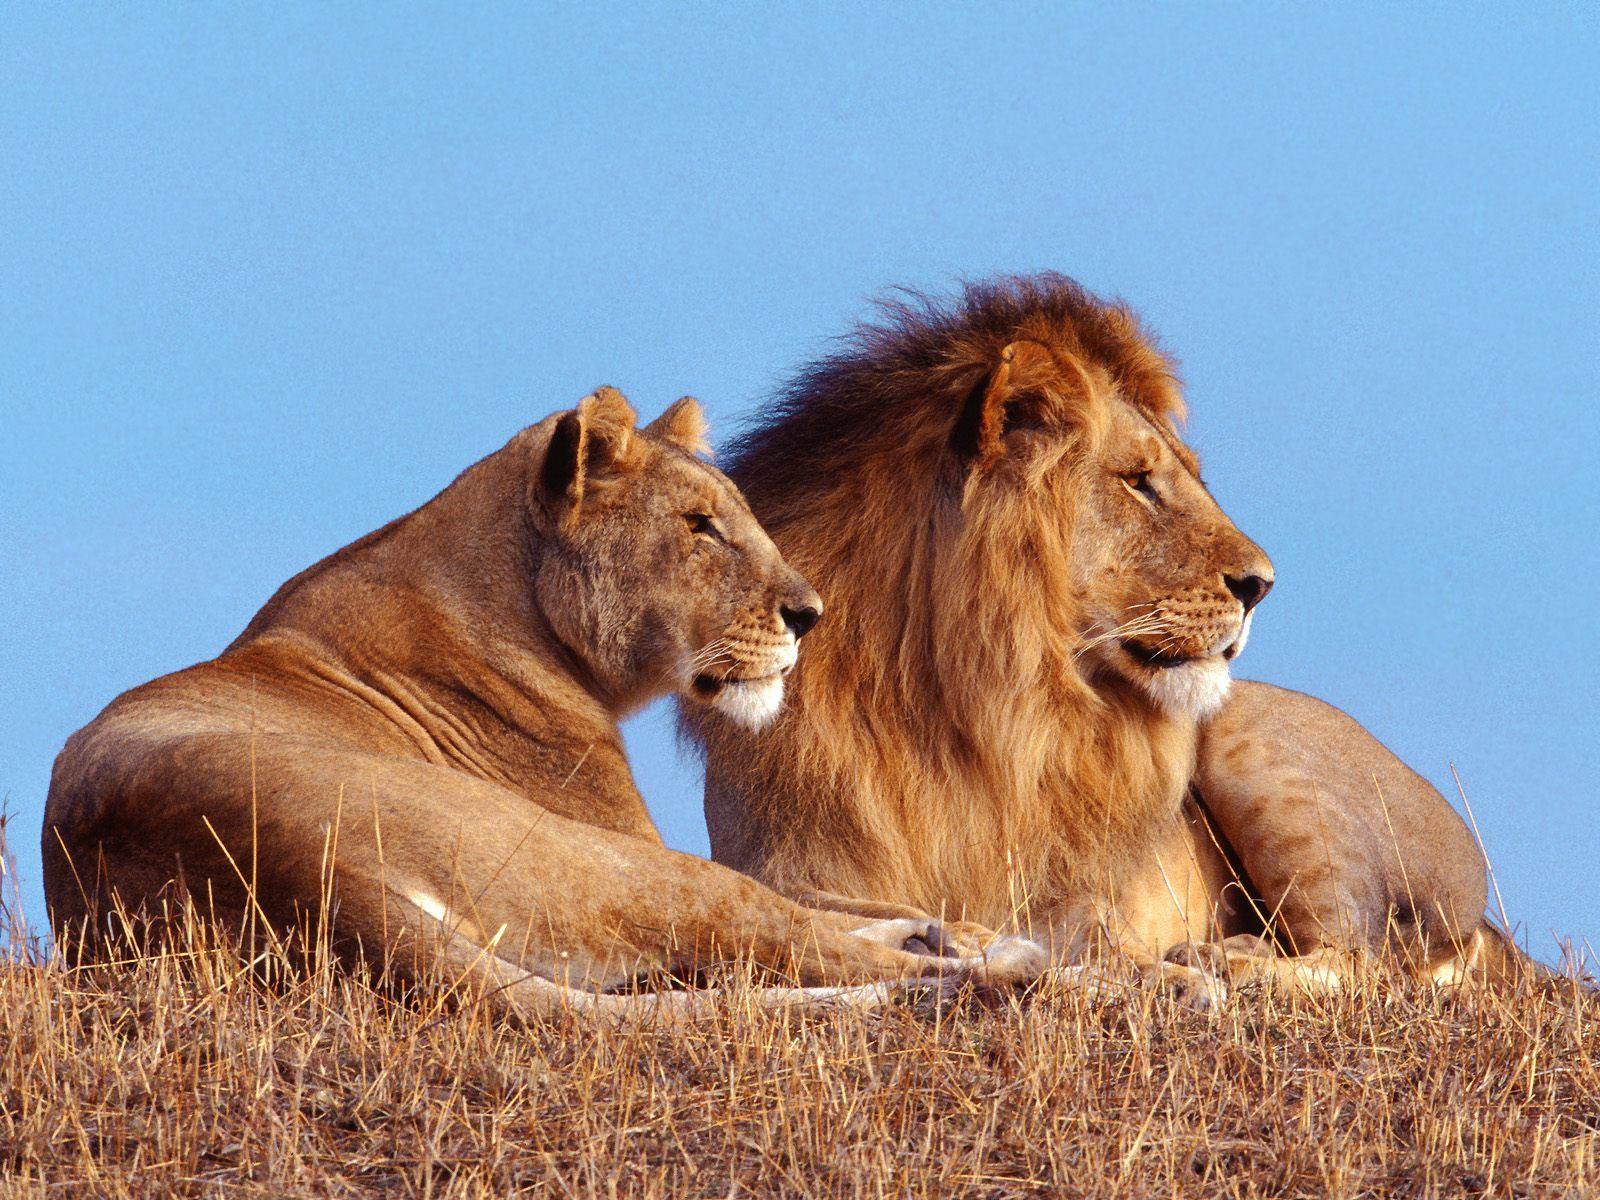 Best Wallpaper Collection: Best Lion HD Wallpapers